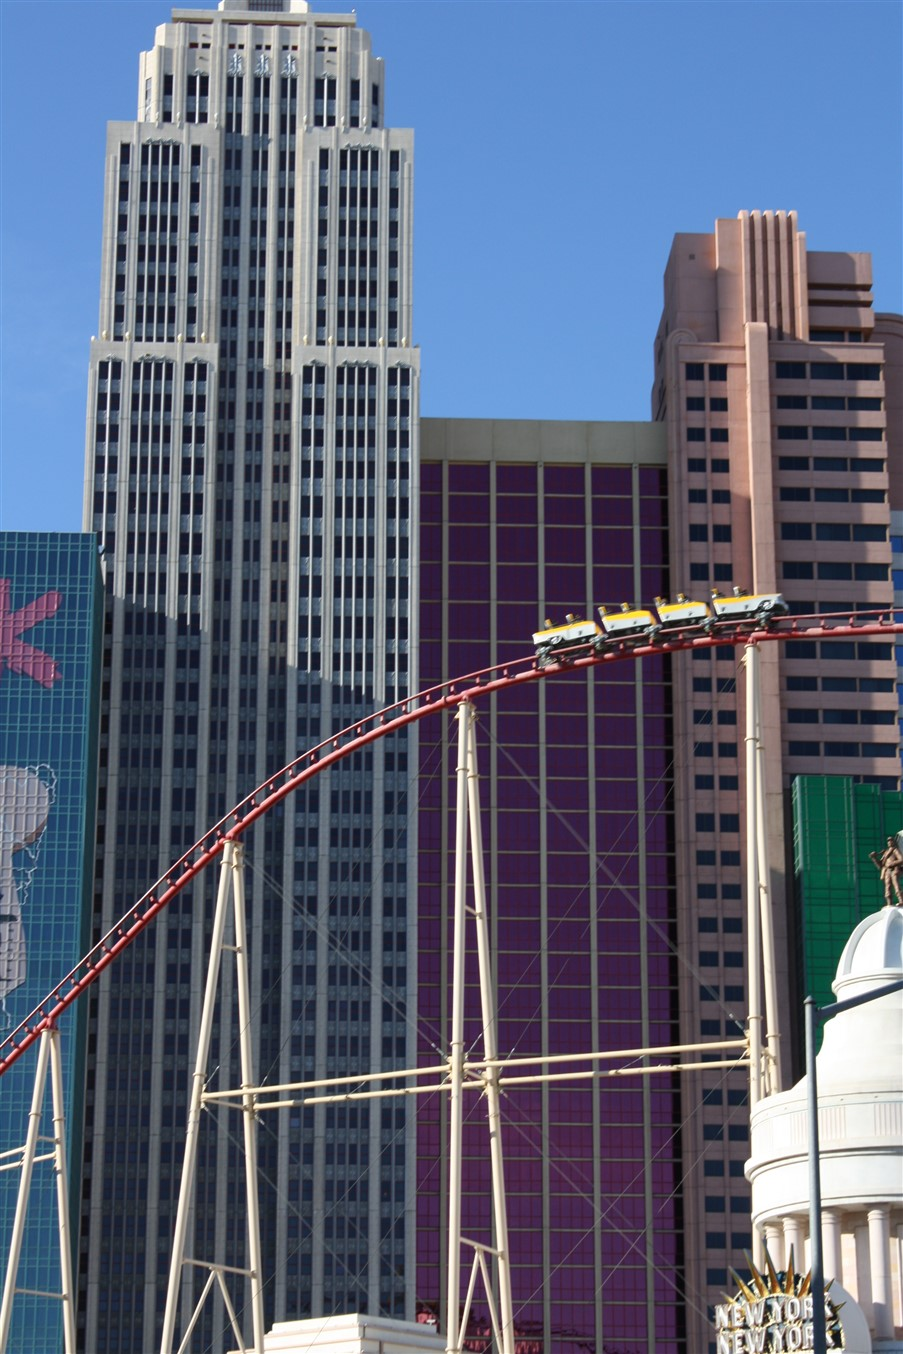 2011 12 04 Las Vegas 35.jpg